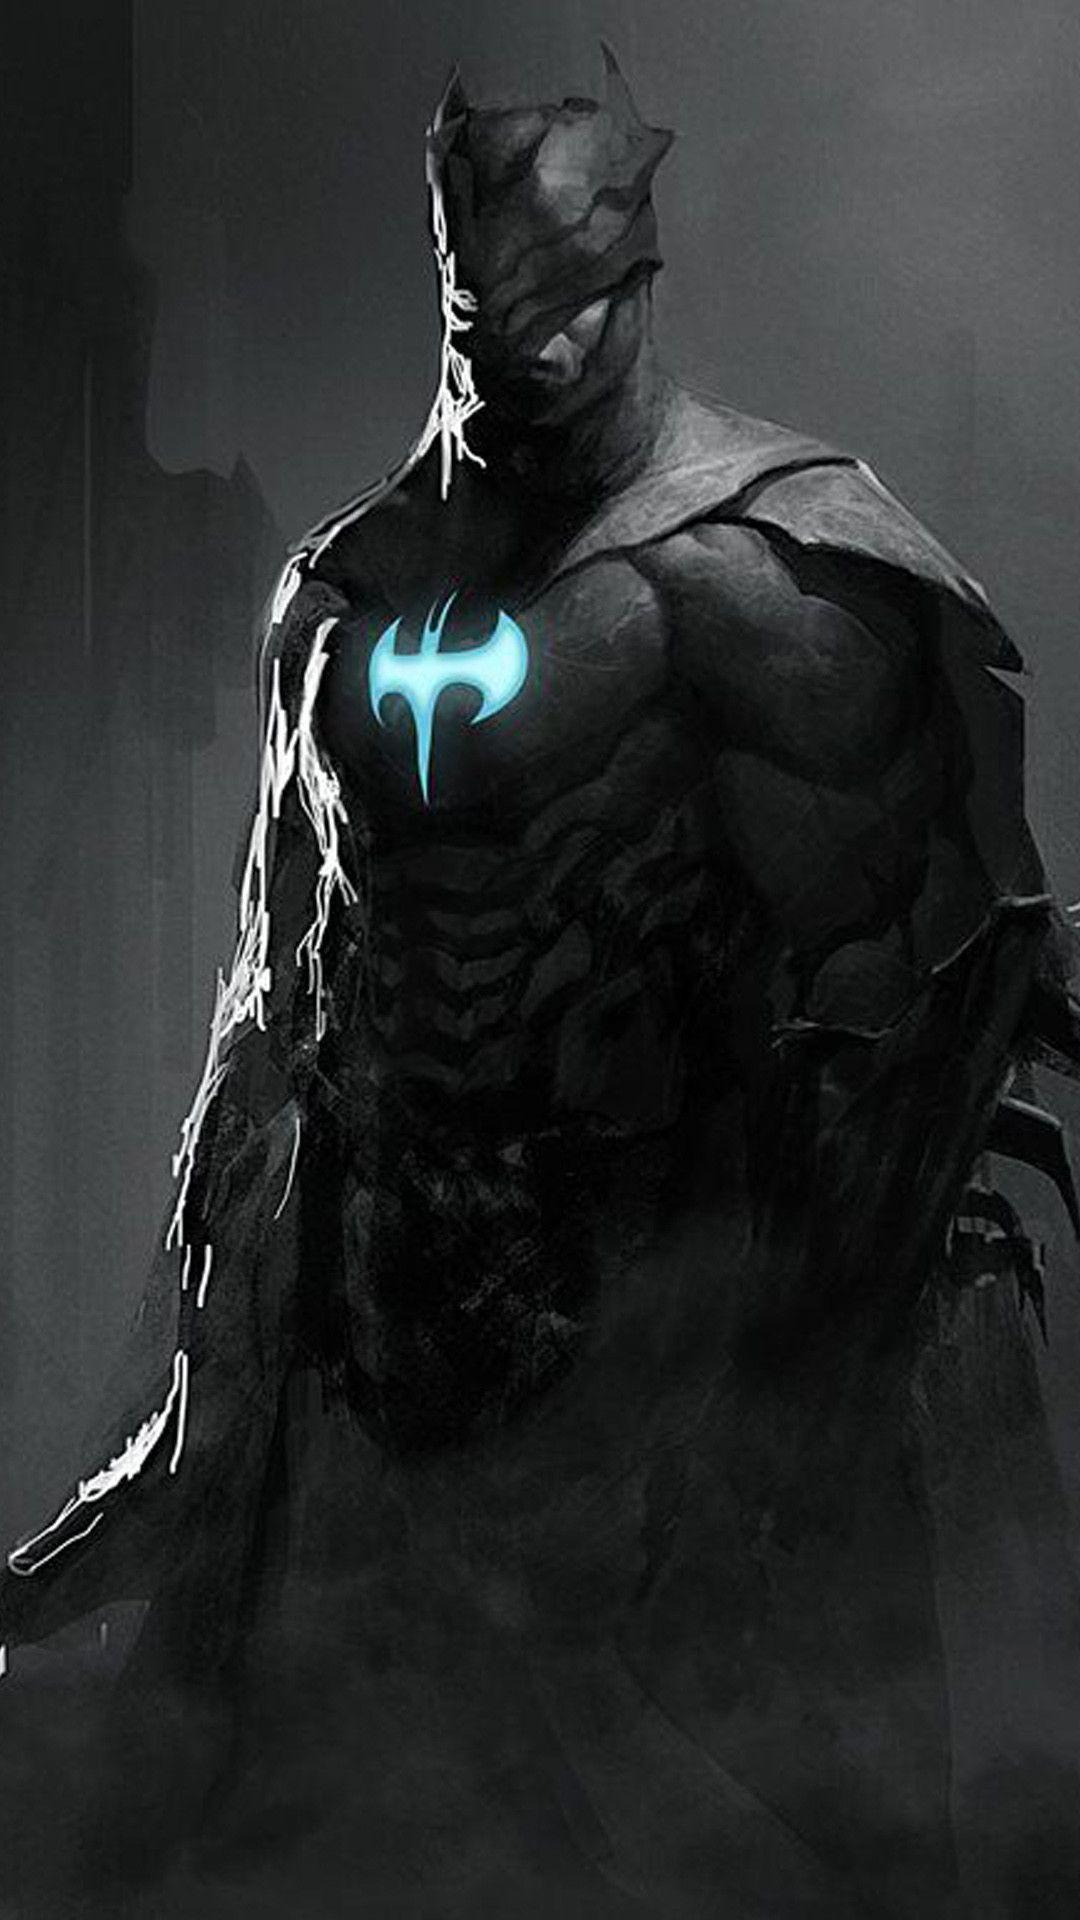 Batman HD Wallpapers 29 Get HD Wallpapers Free Batman